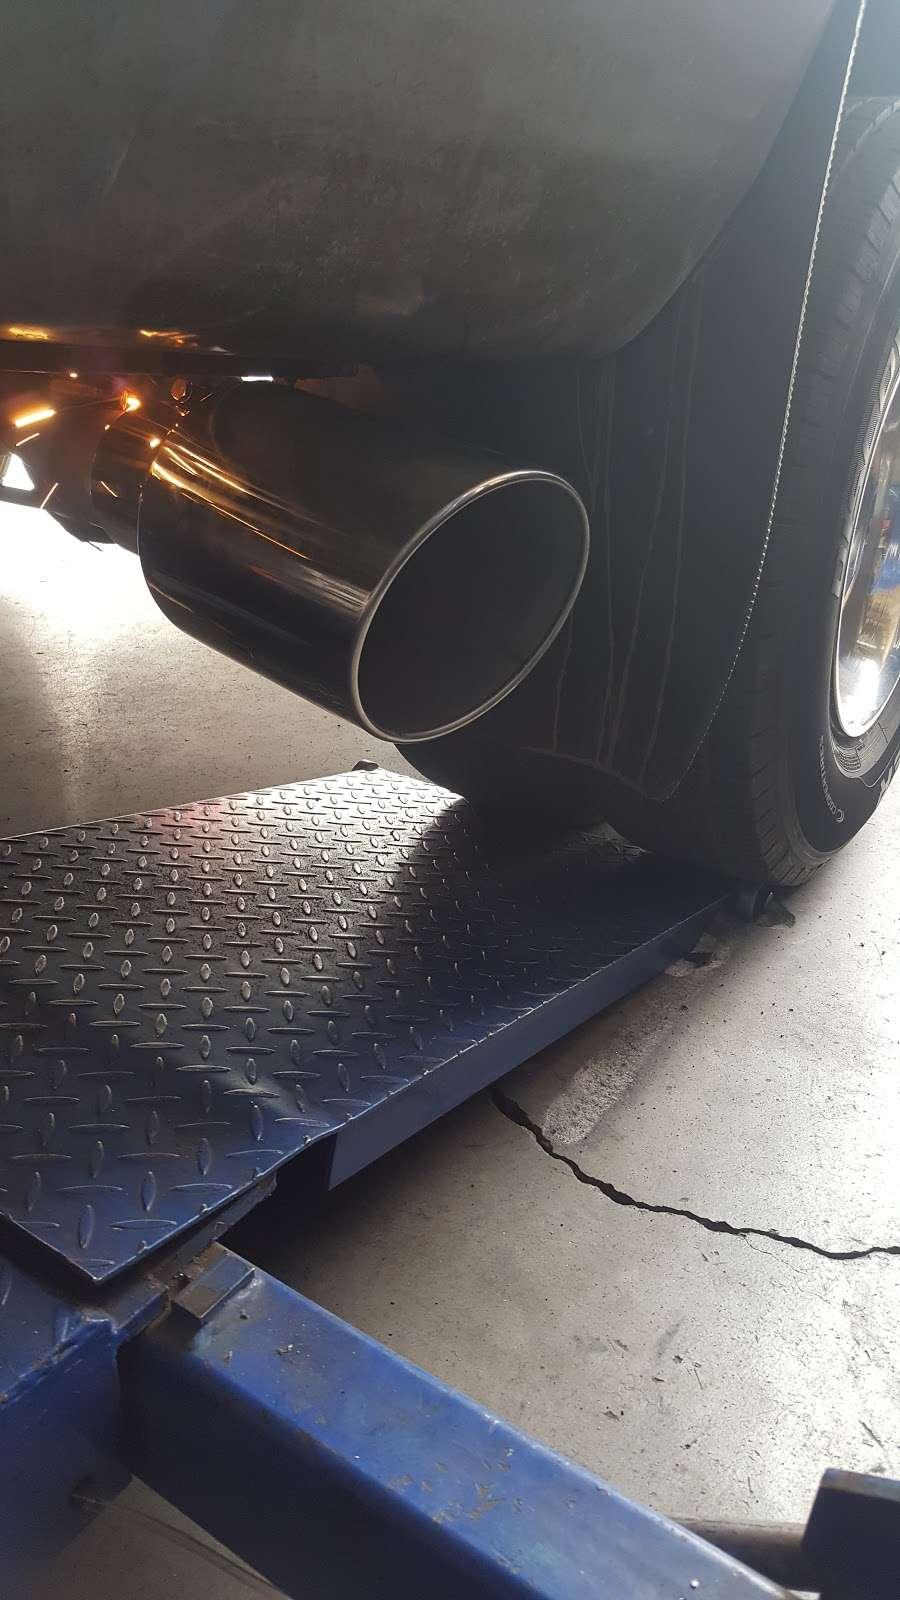 Mufflers Arizona National llc #2 - car repair  | Photo 5 of 10 | Address: 6858 W Indian School Rd, Phoenix, AZ 85033, USA | Phone: (623) 873-7917